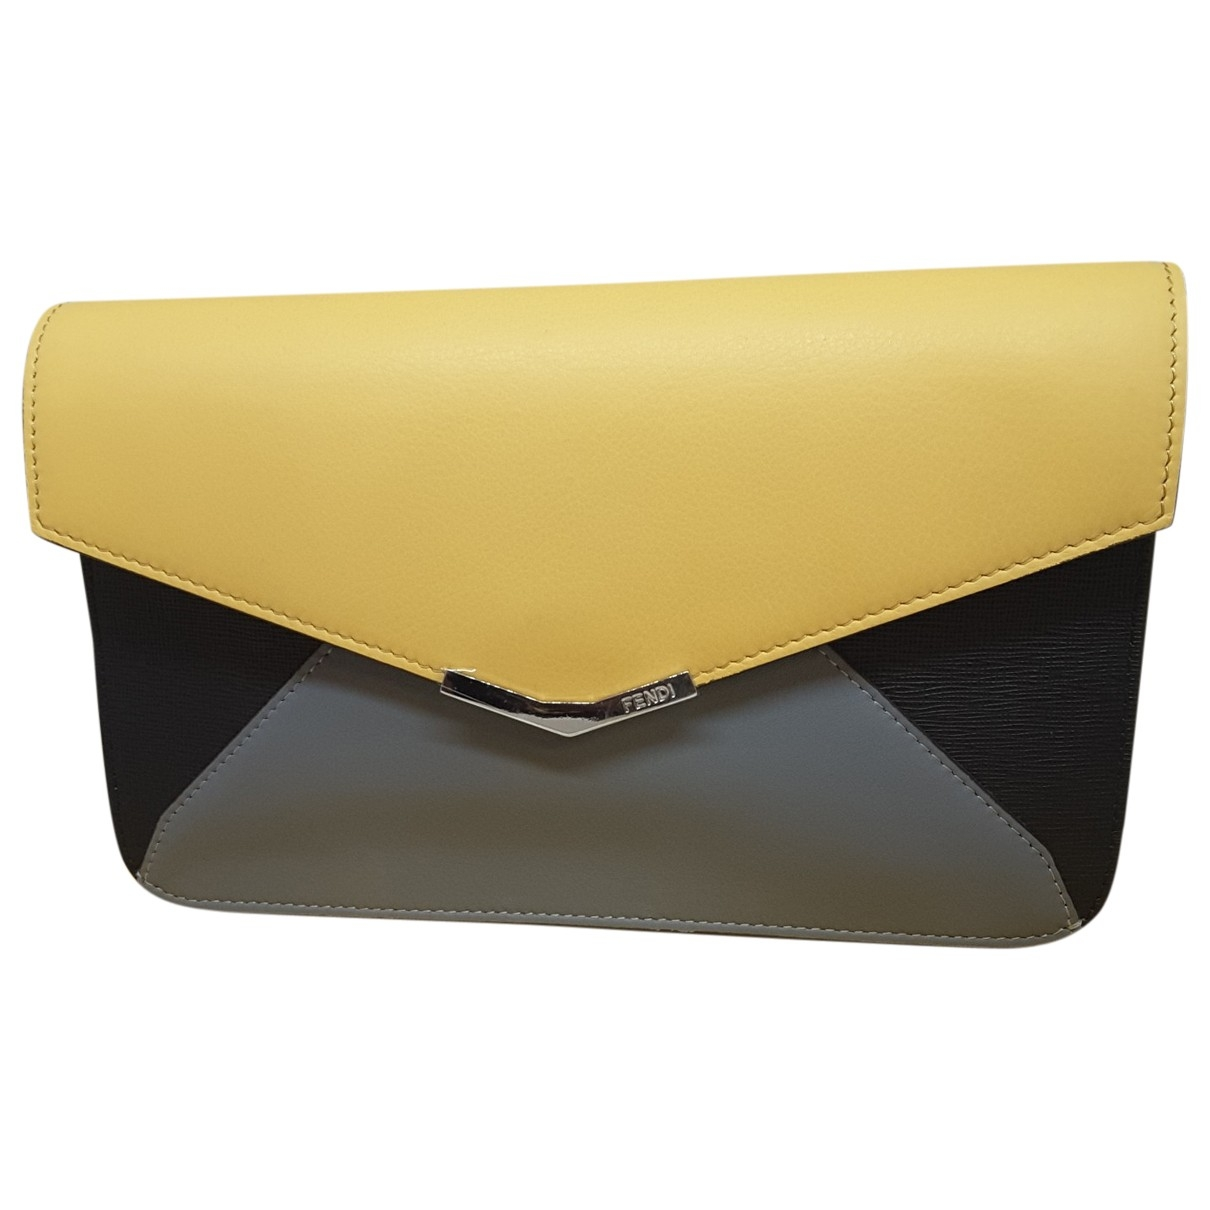 Fendi \N Clutch in  Gelb Leder